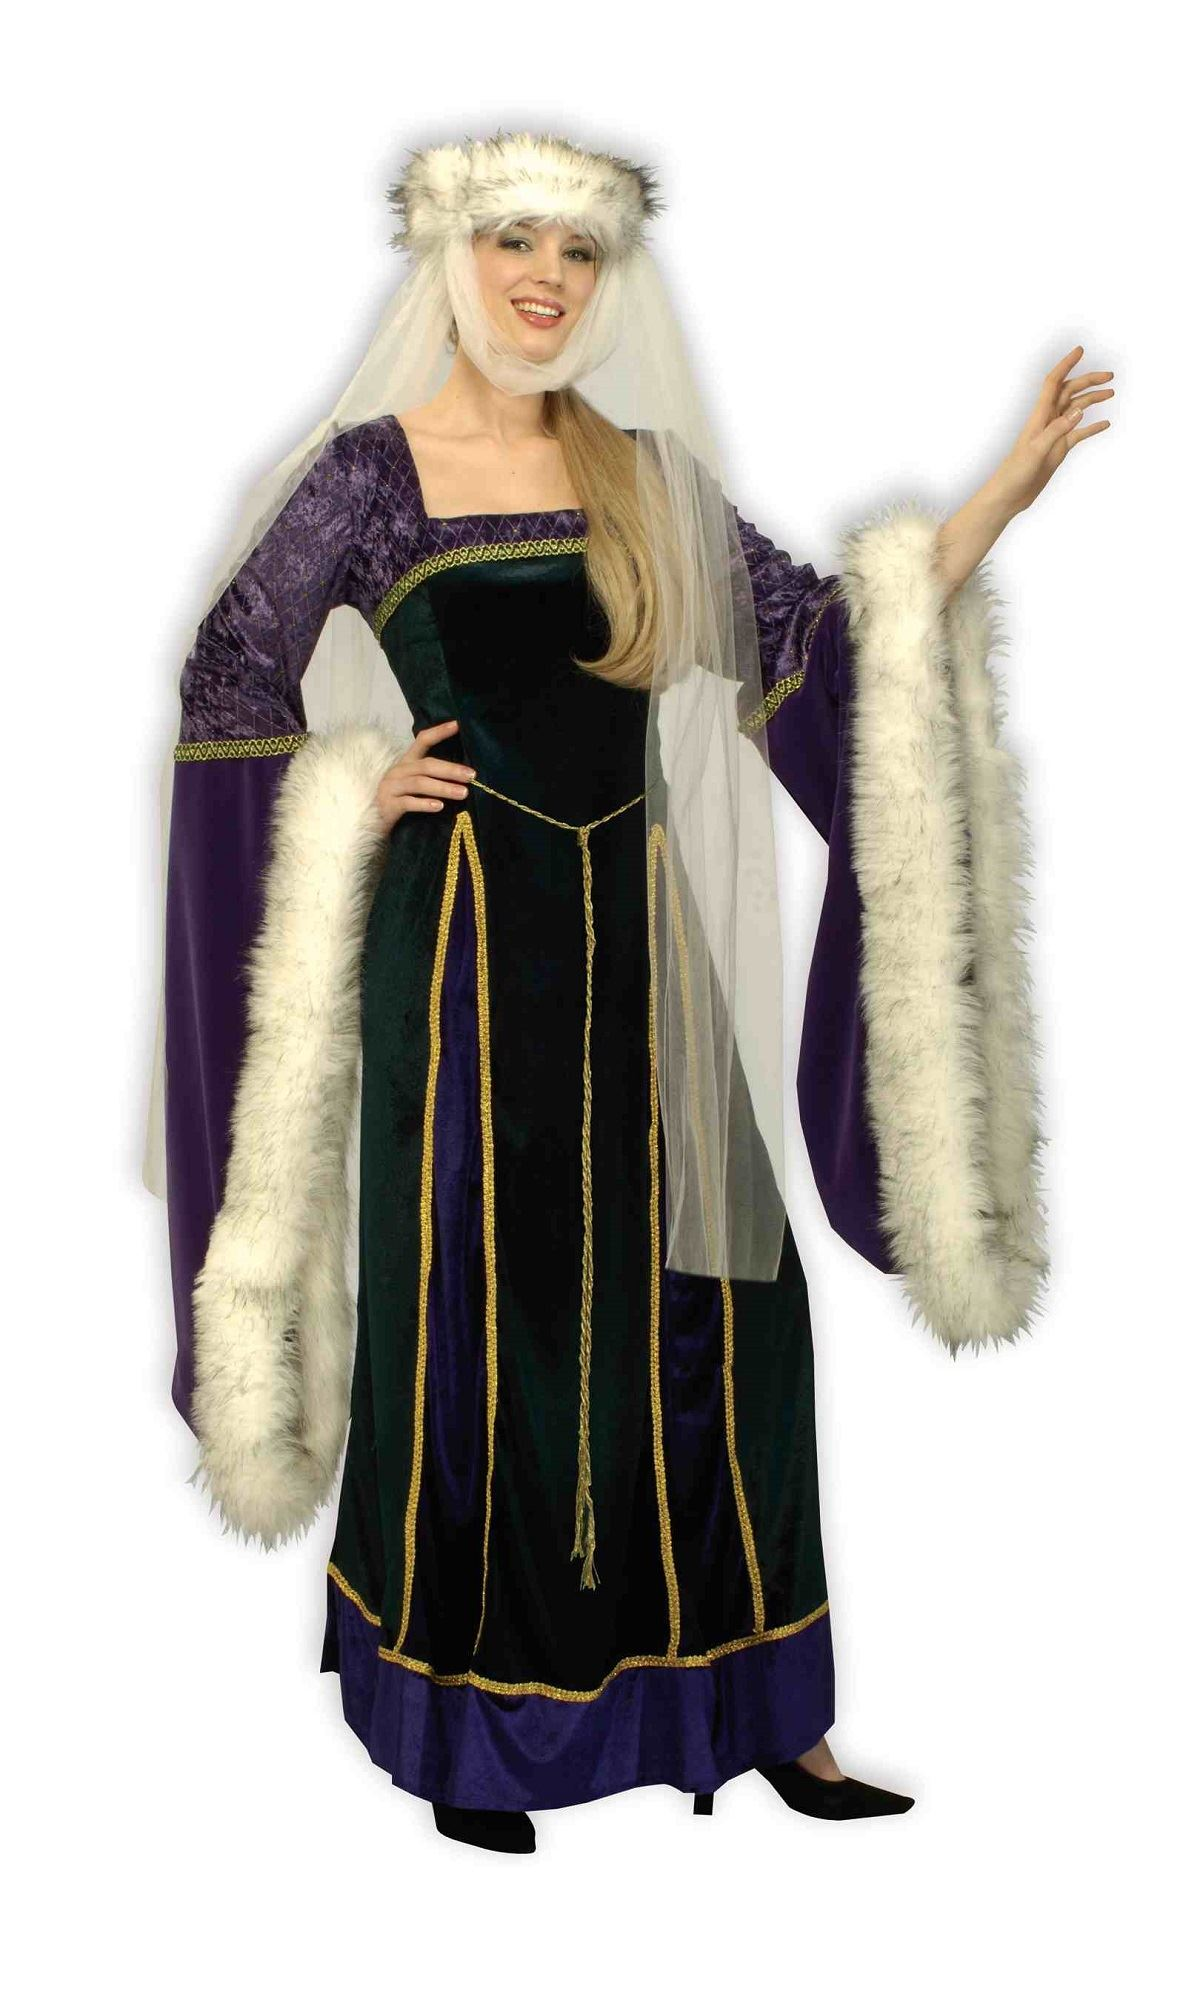 Adult Medieval Lady Woman Renaissance Costume  sc 1 st  The Costume Land & Adult Medieval Lady Woman Renaissance Costume | $69.99 | The Costume ...